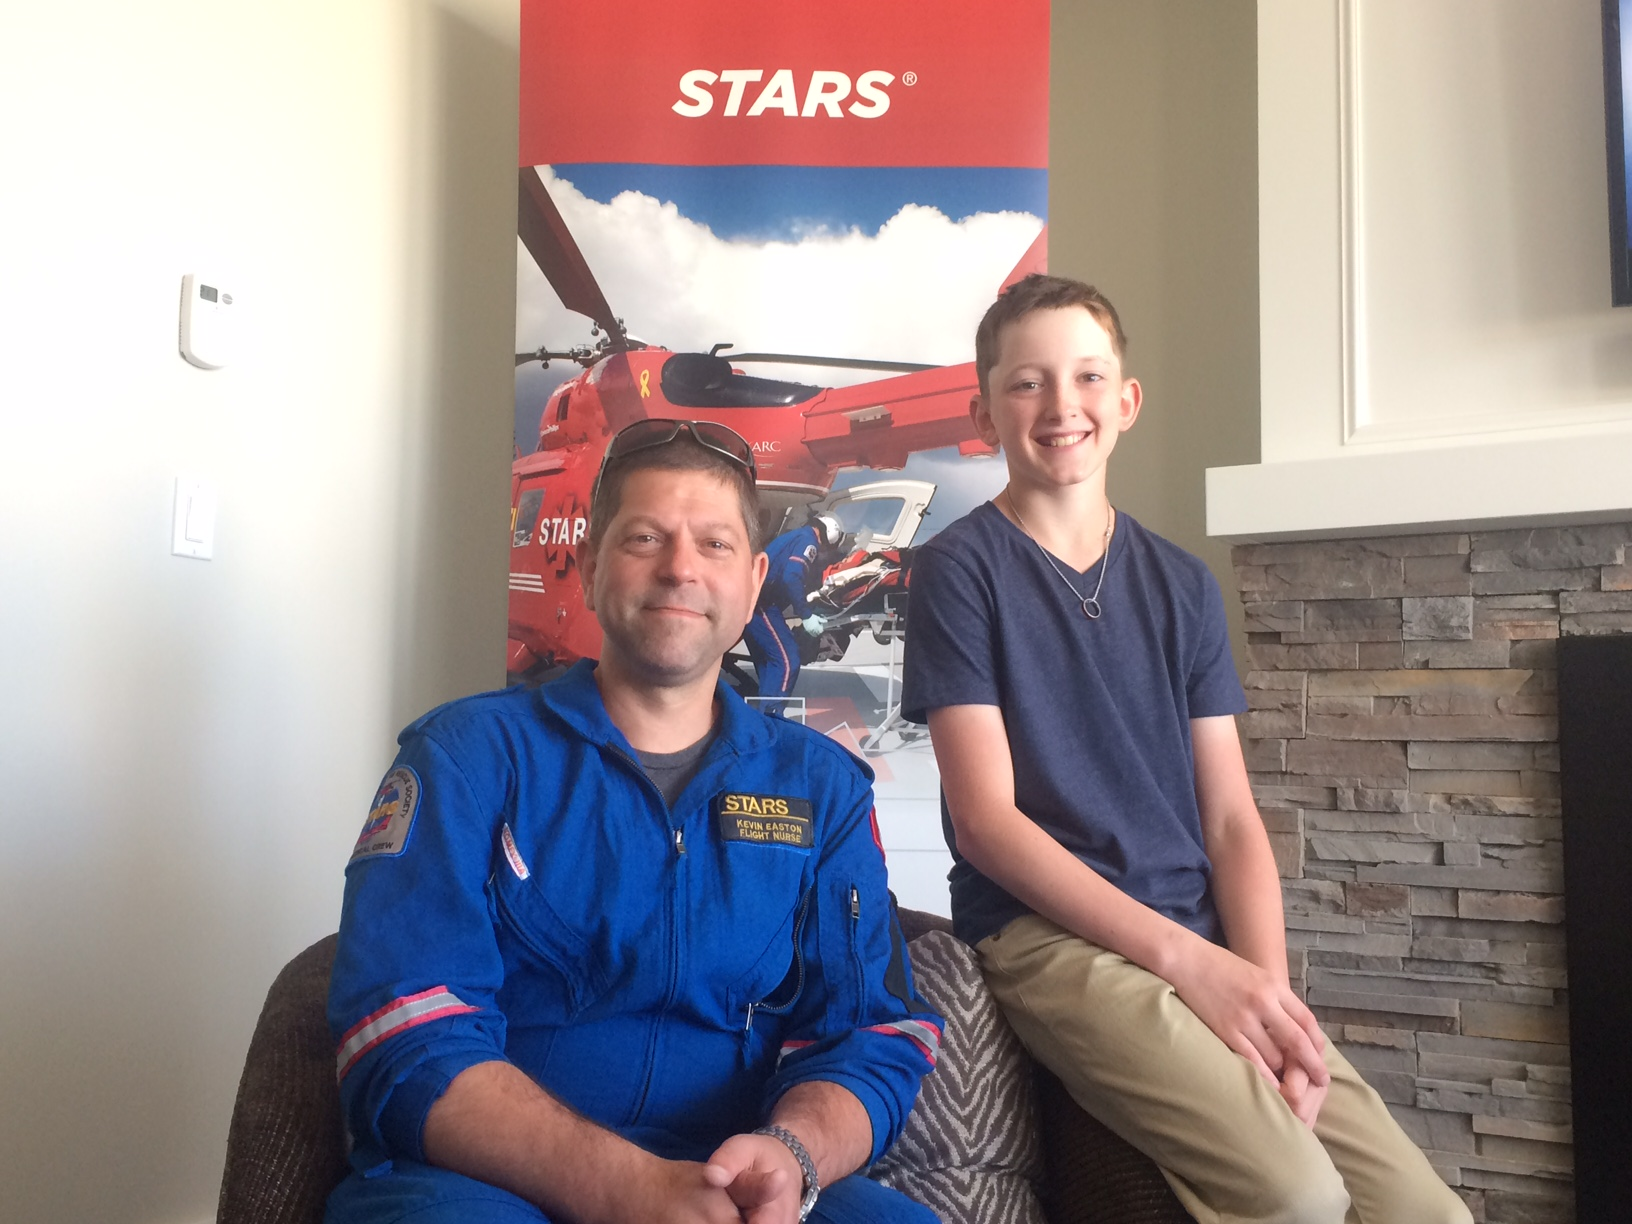 2017 Stars Home Lottery officially kicks off in Saskatchewan